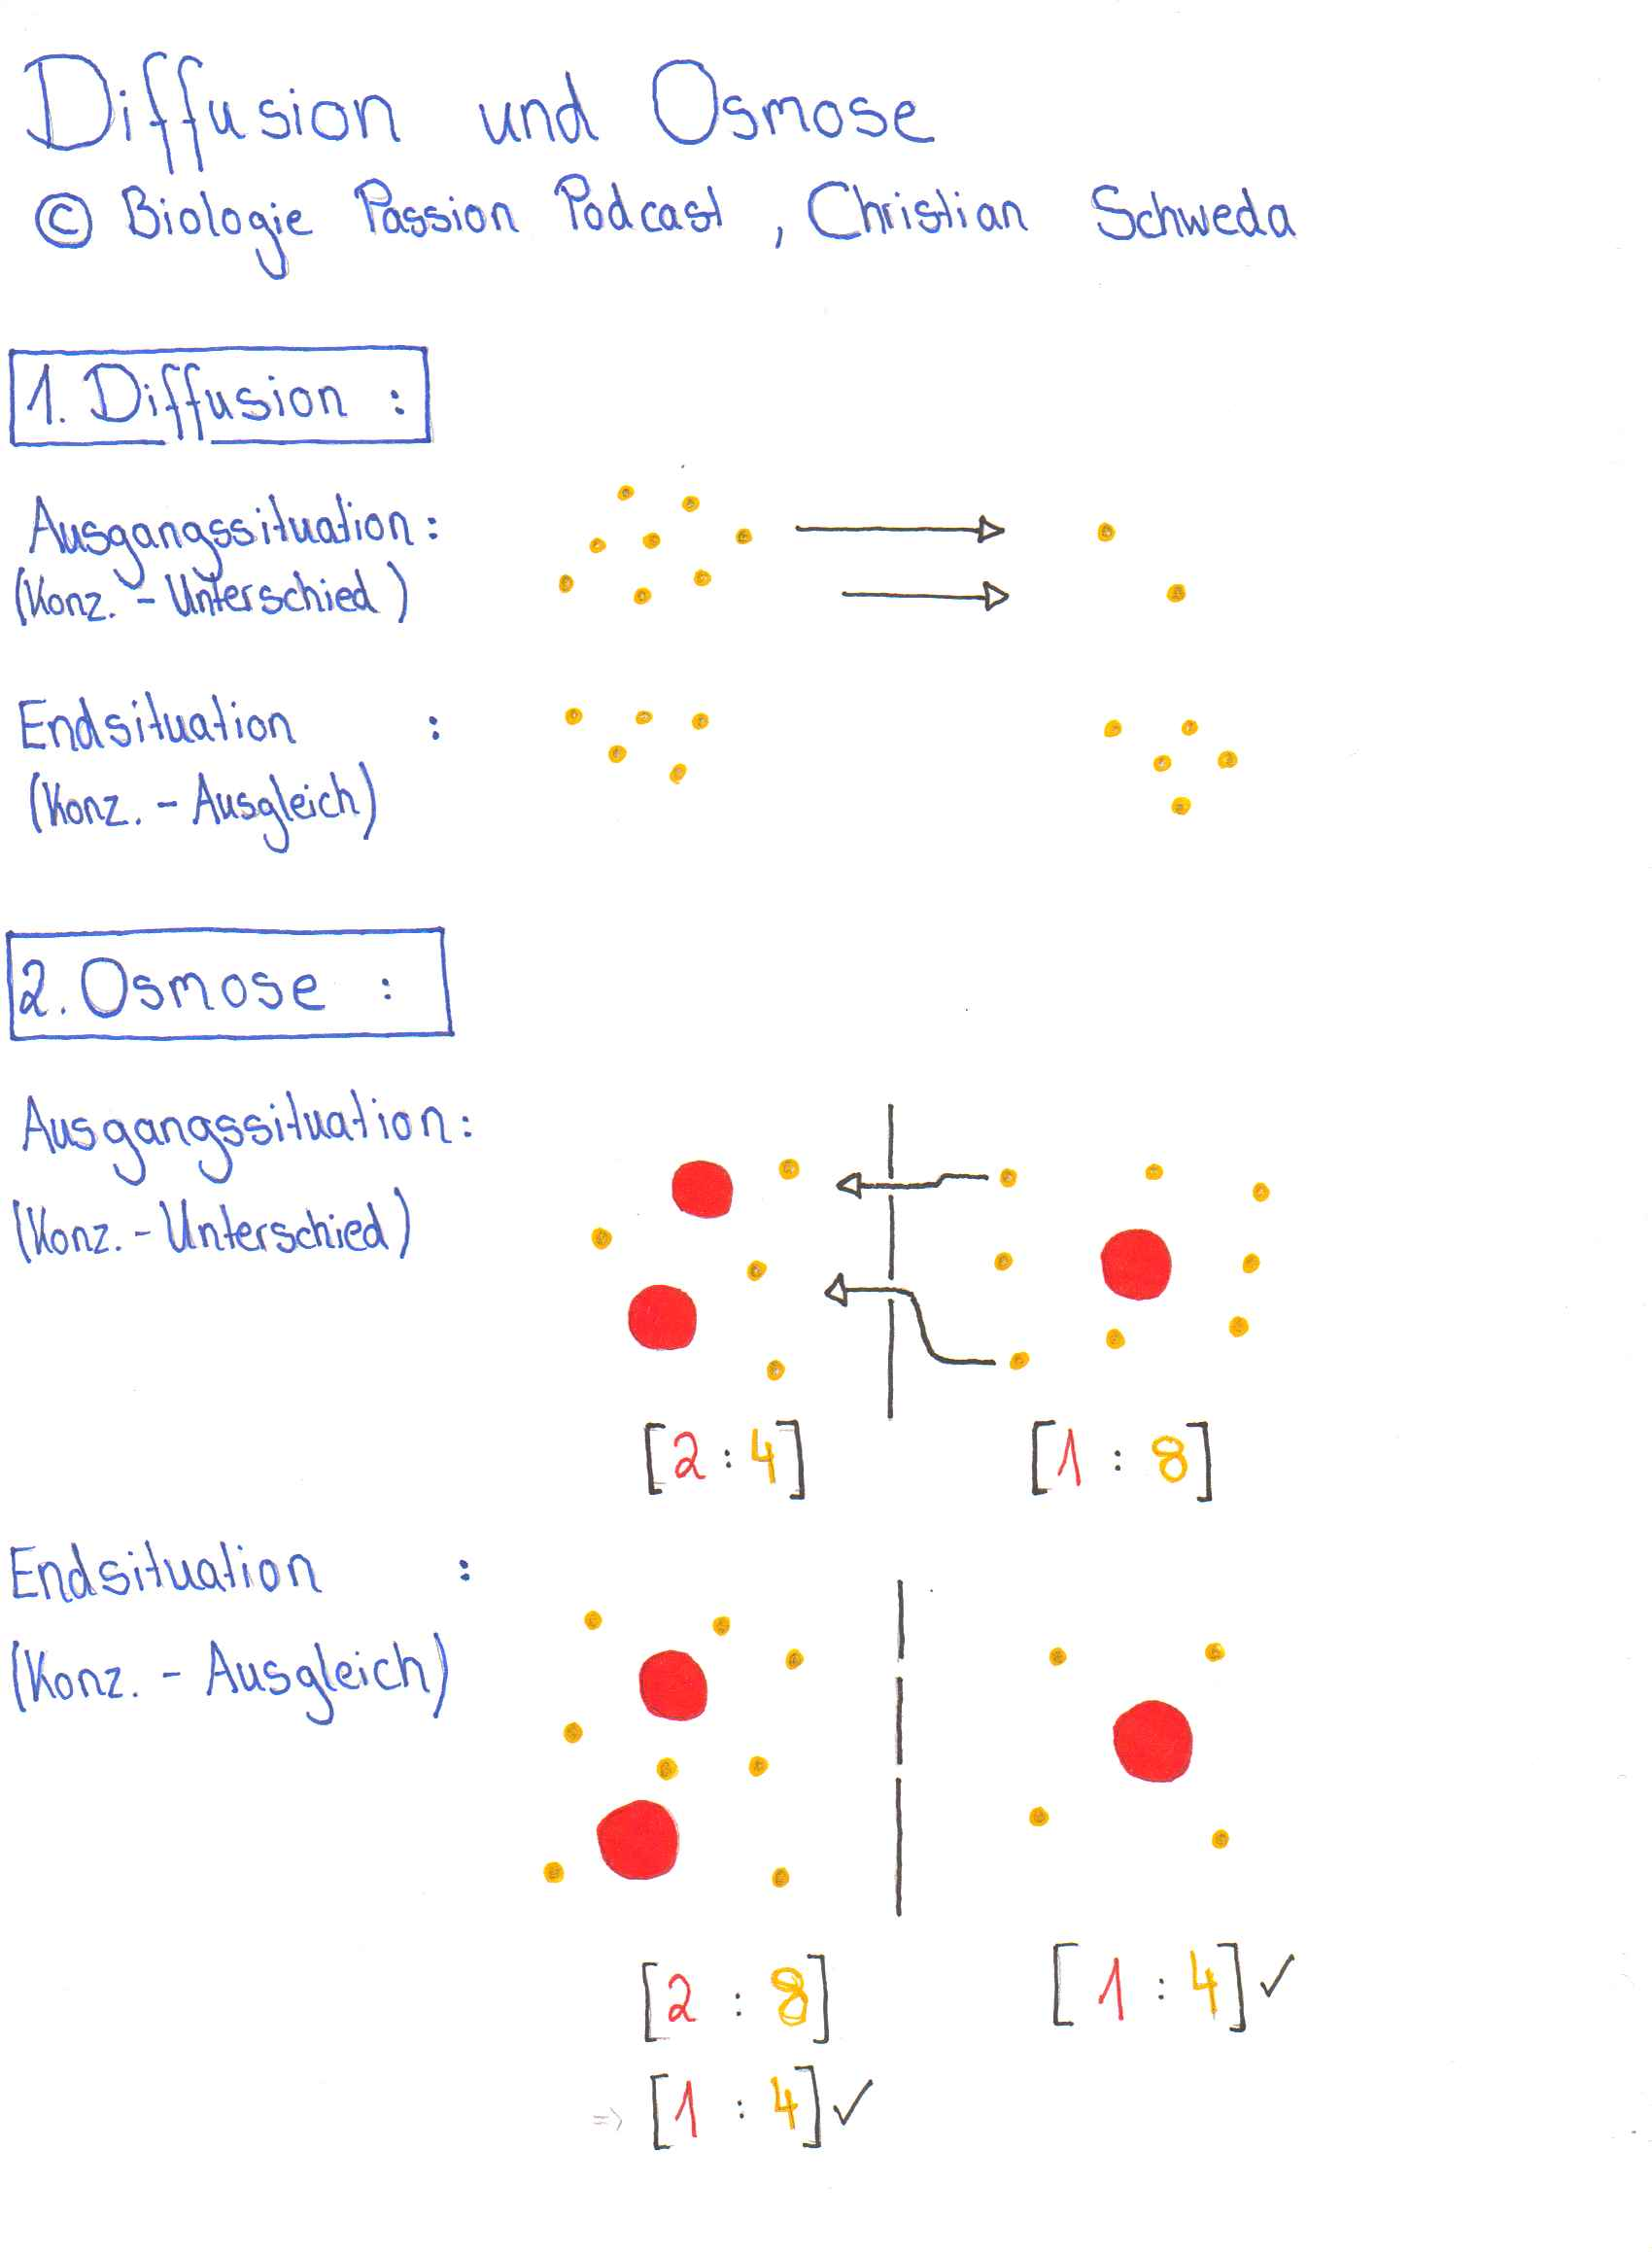 Folge 011 - Brownsche Molekularbewegung: Diffusion und Osmose